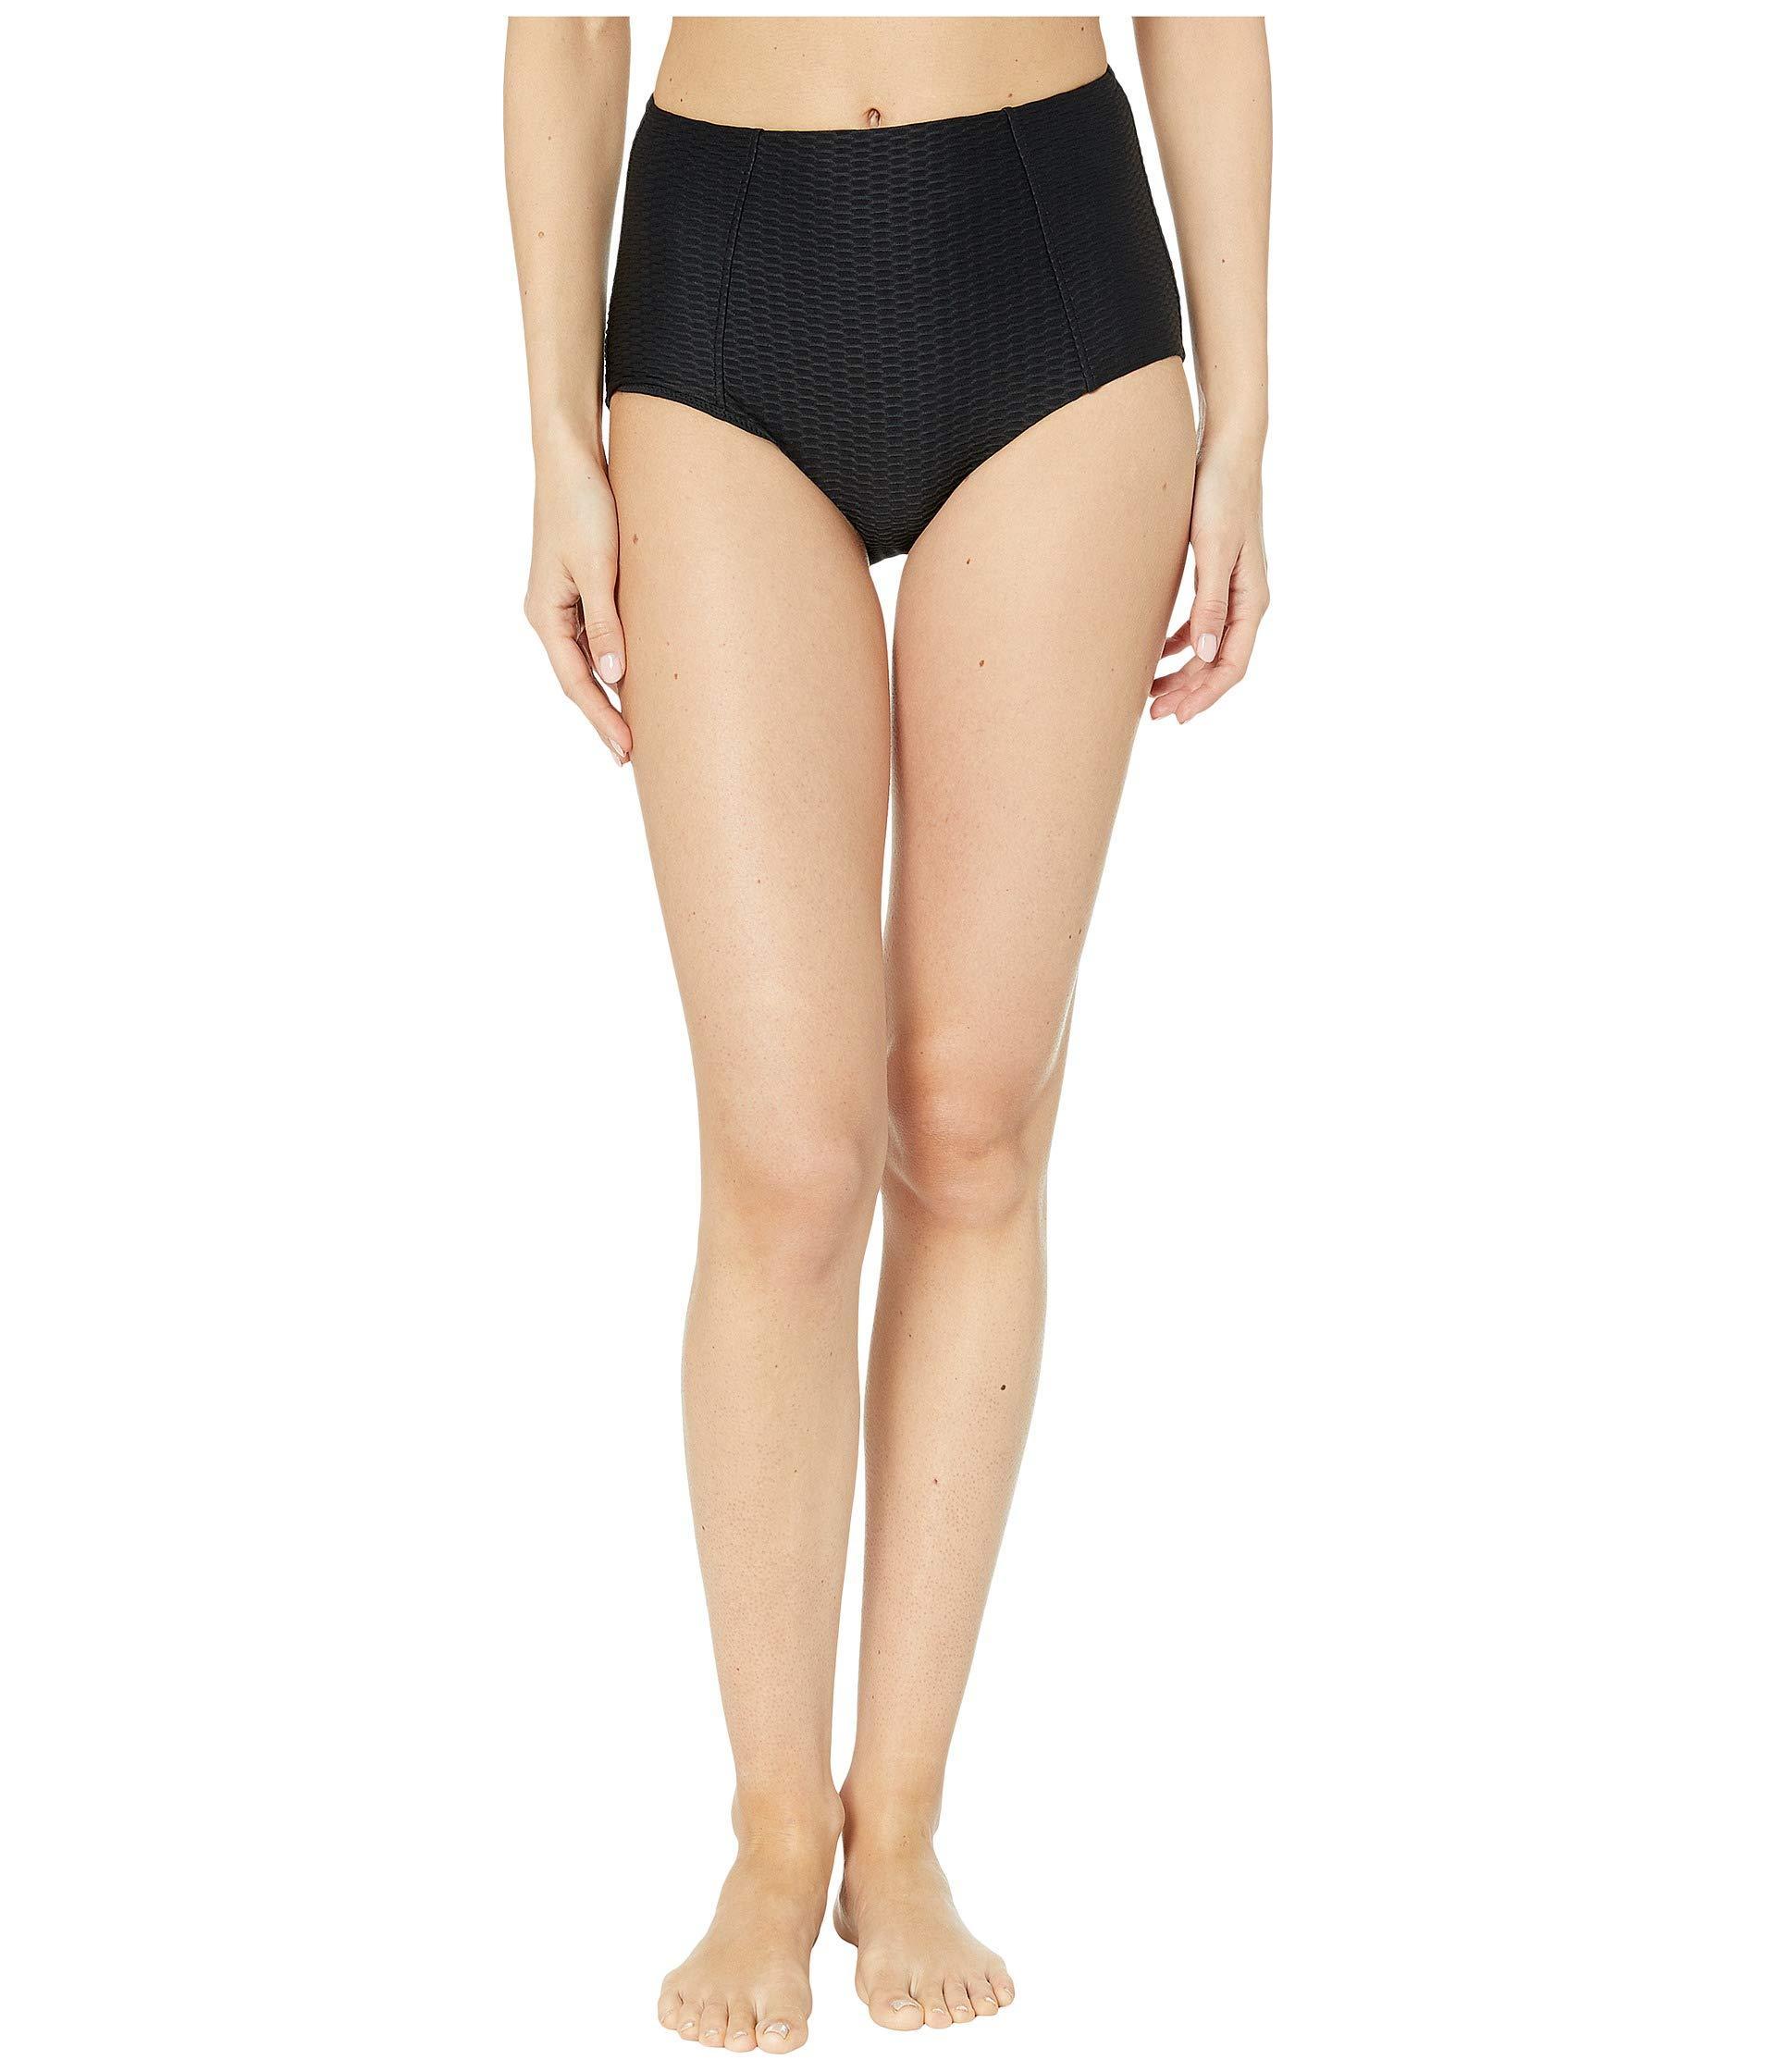 271b85eb5b6d1 Seafolly La Luna High Waisted Bikini Pants (black) Women's Swimwear ...